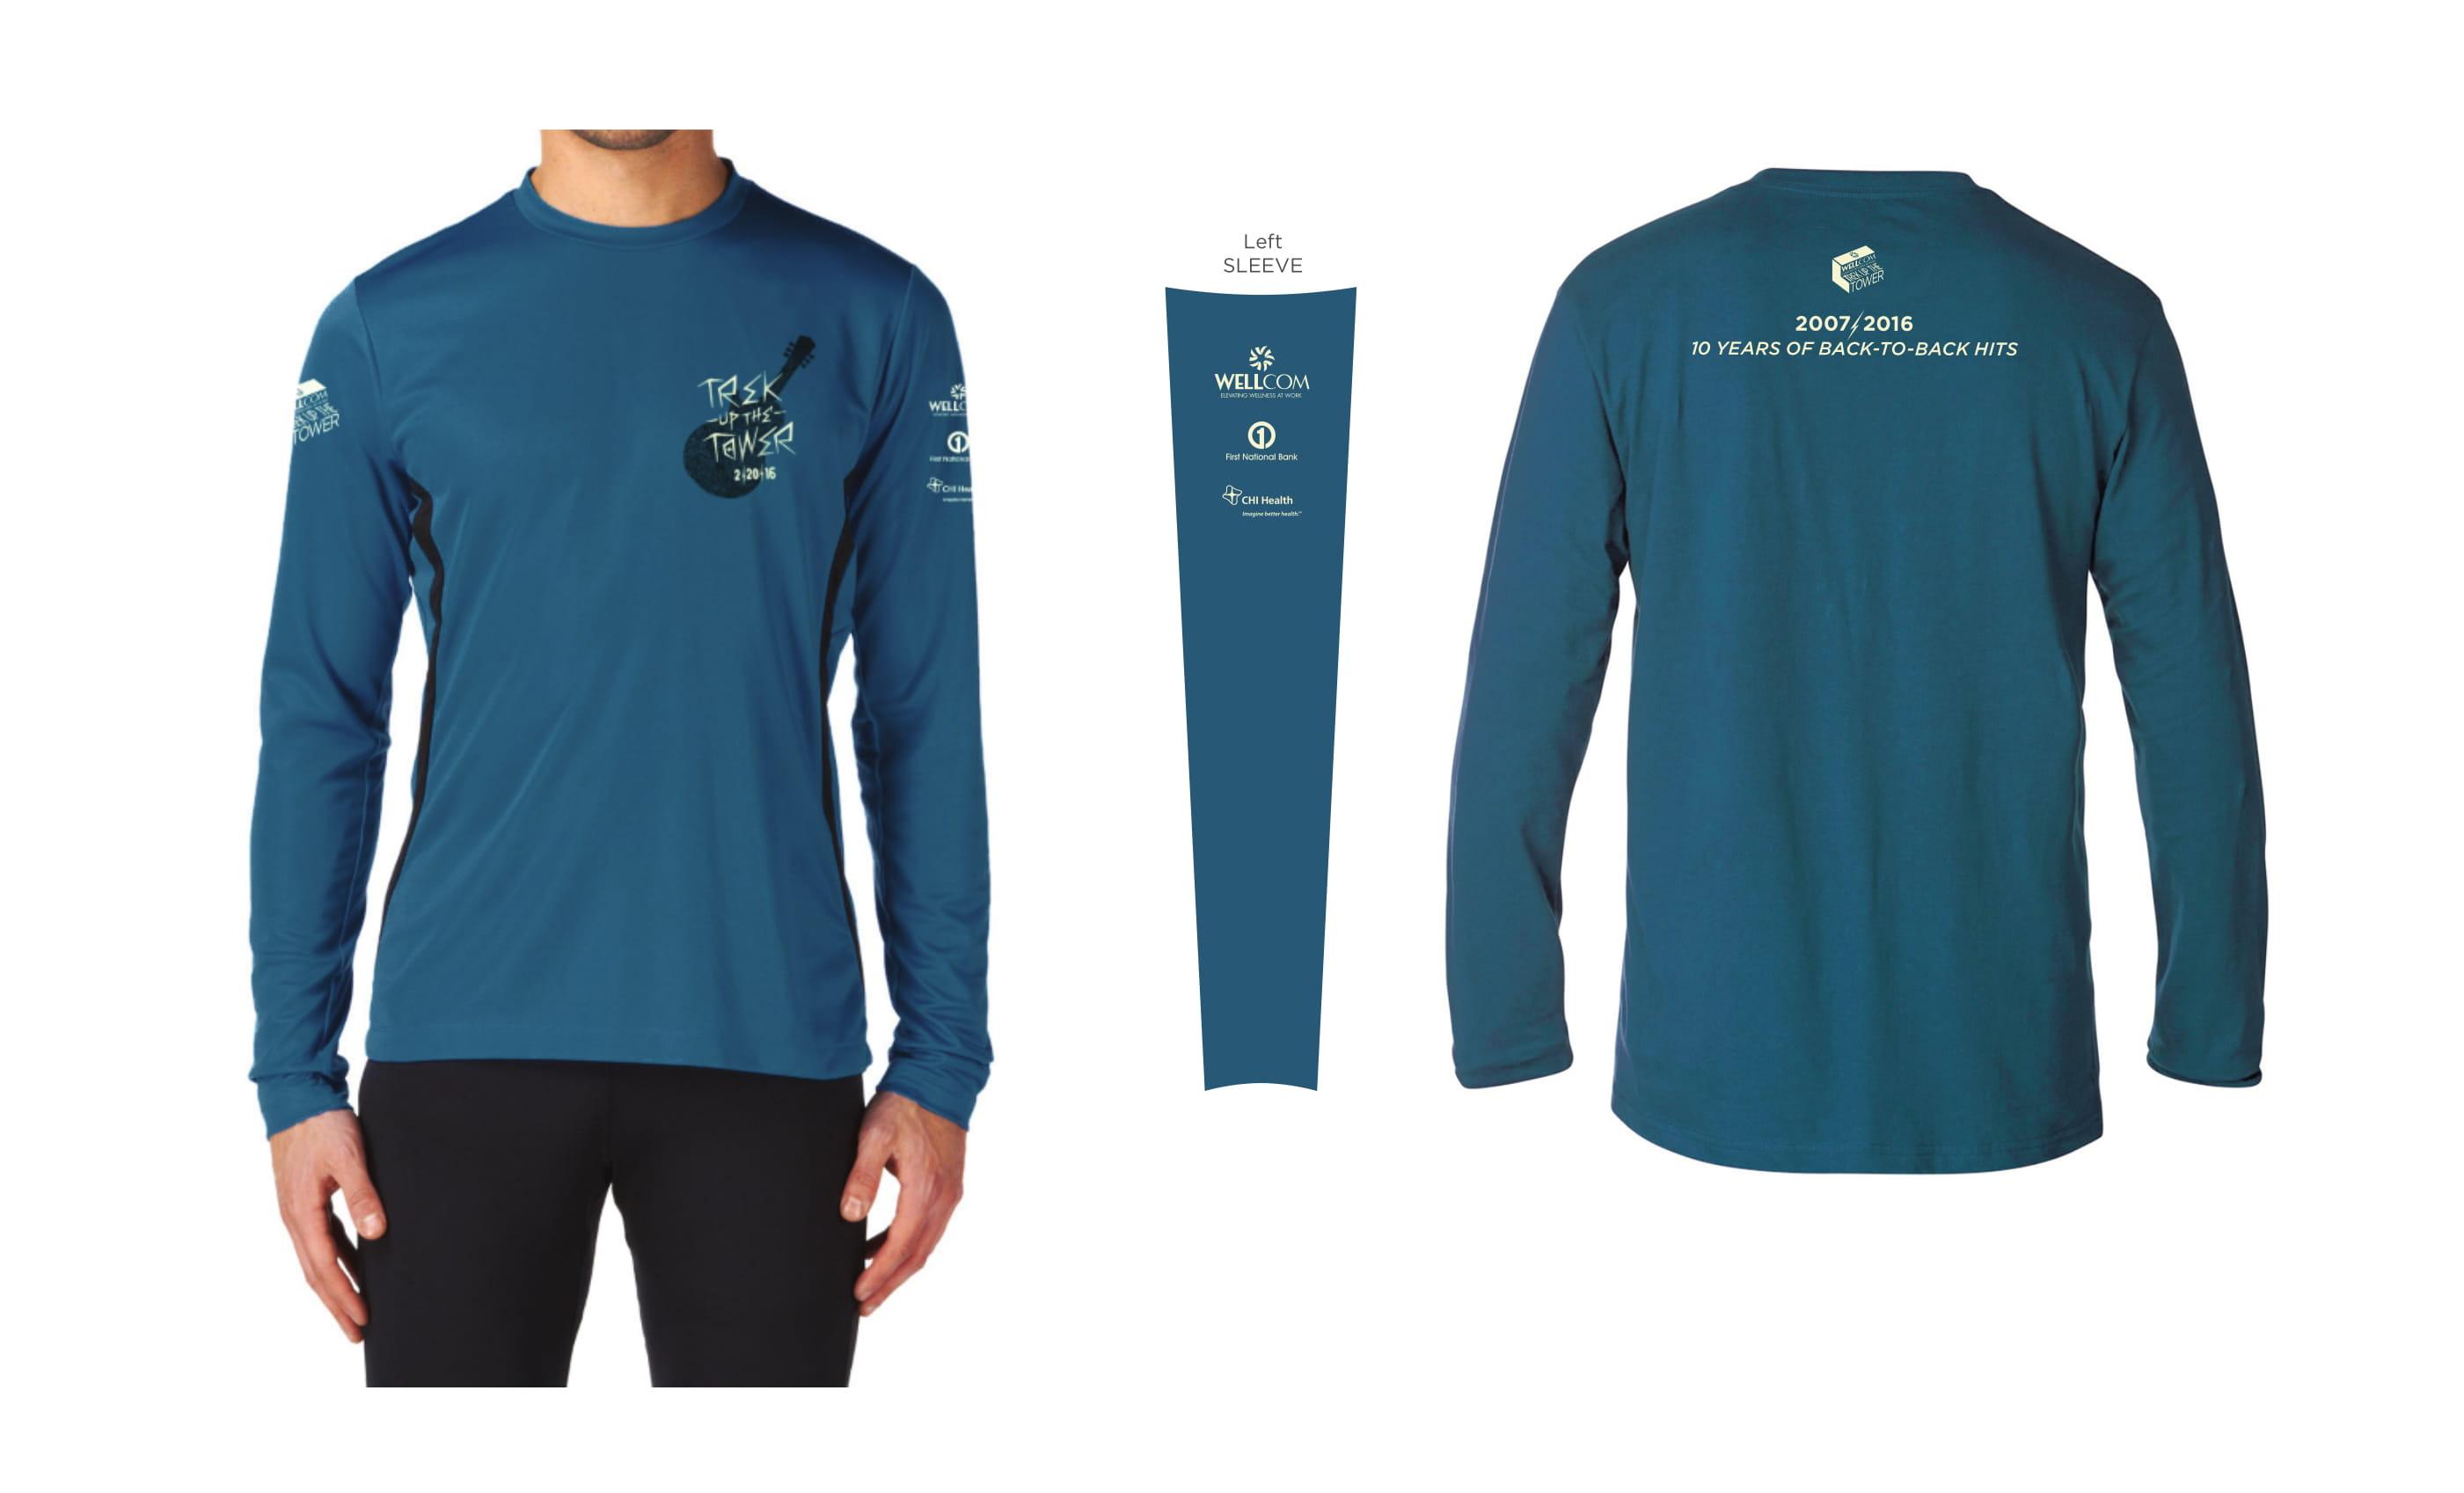 2016 Trek Up the Tower Participant Shirt